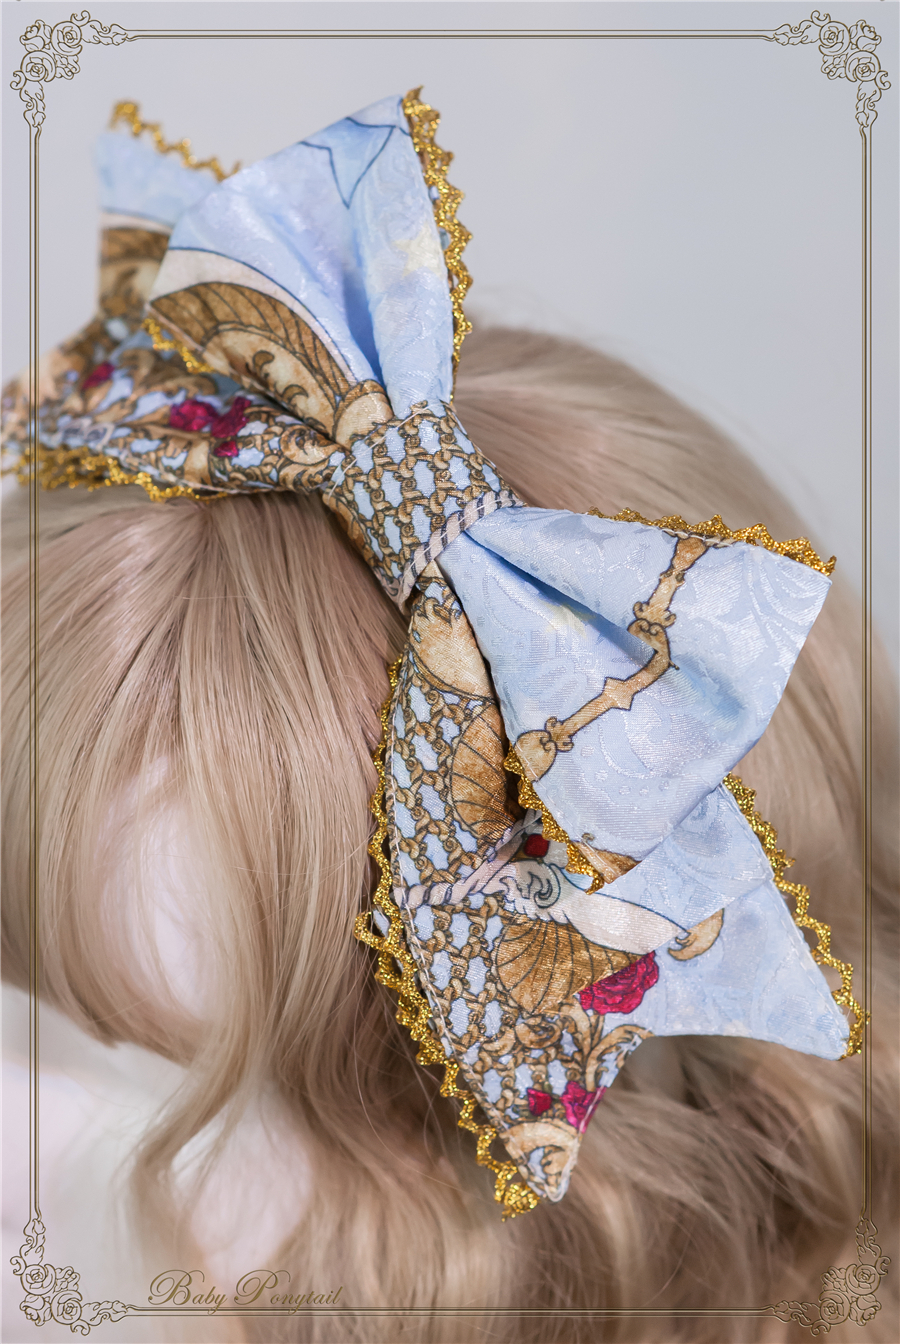 Baby Ponytail_Stock photo_Circus Princess_KC Sax_01.jpg